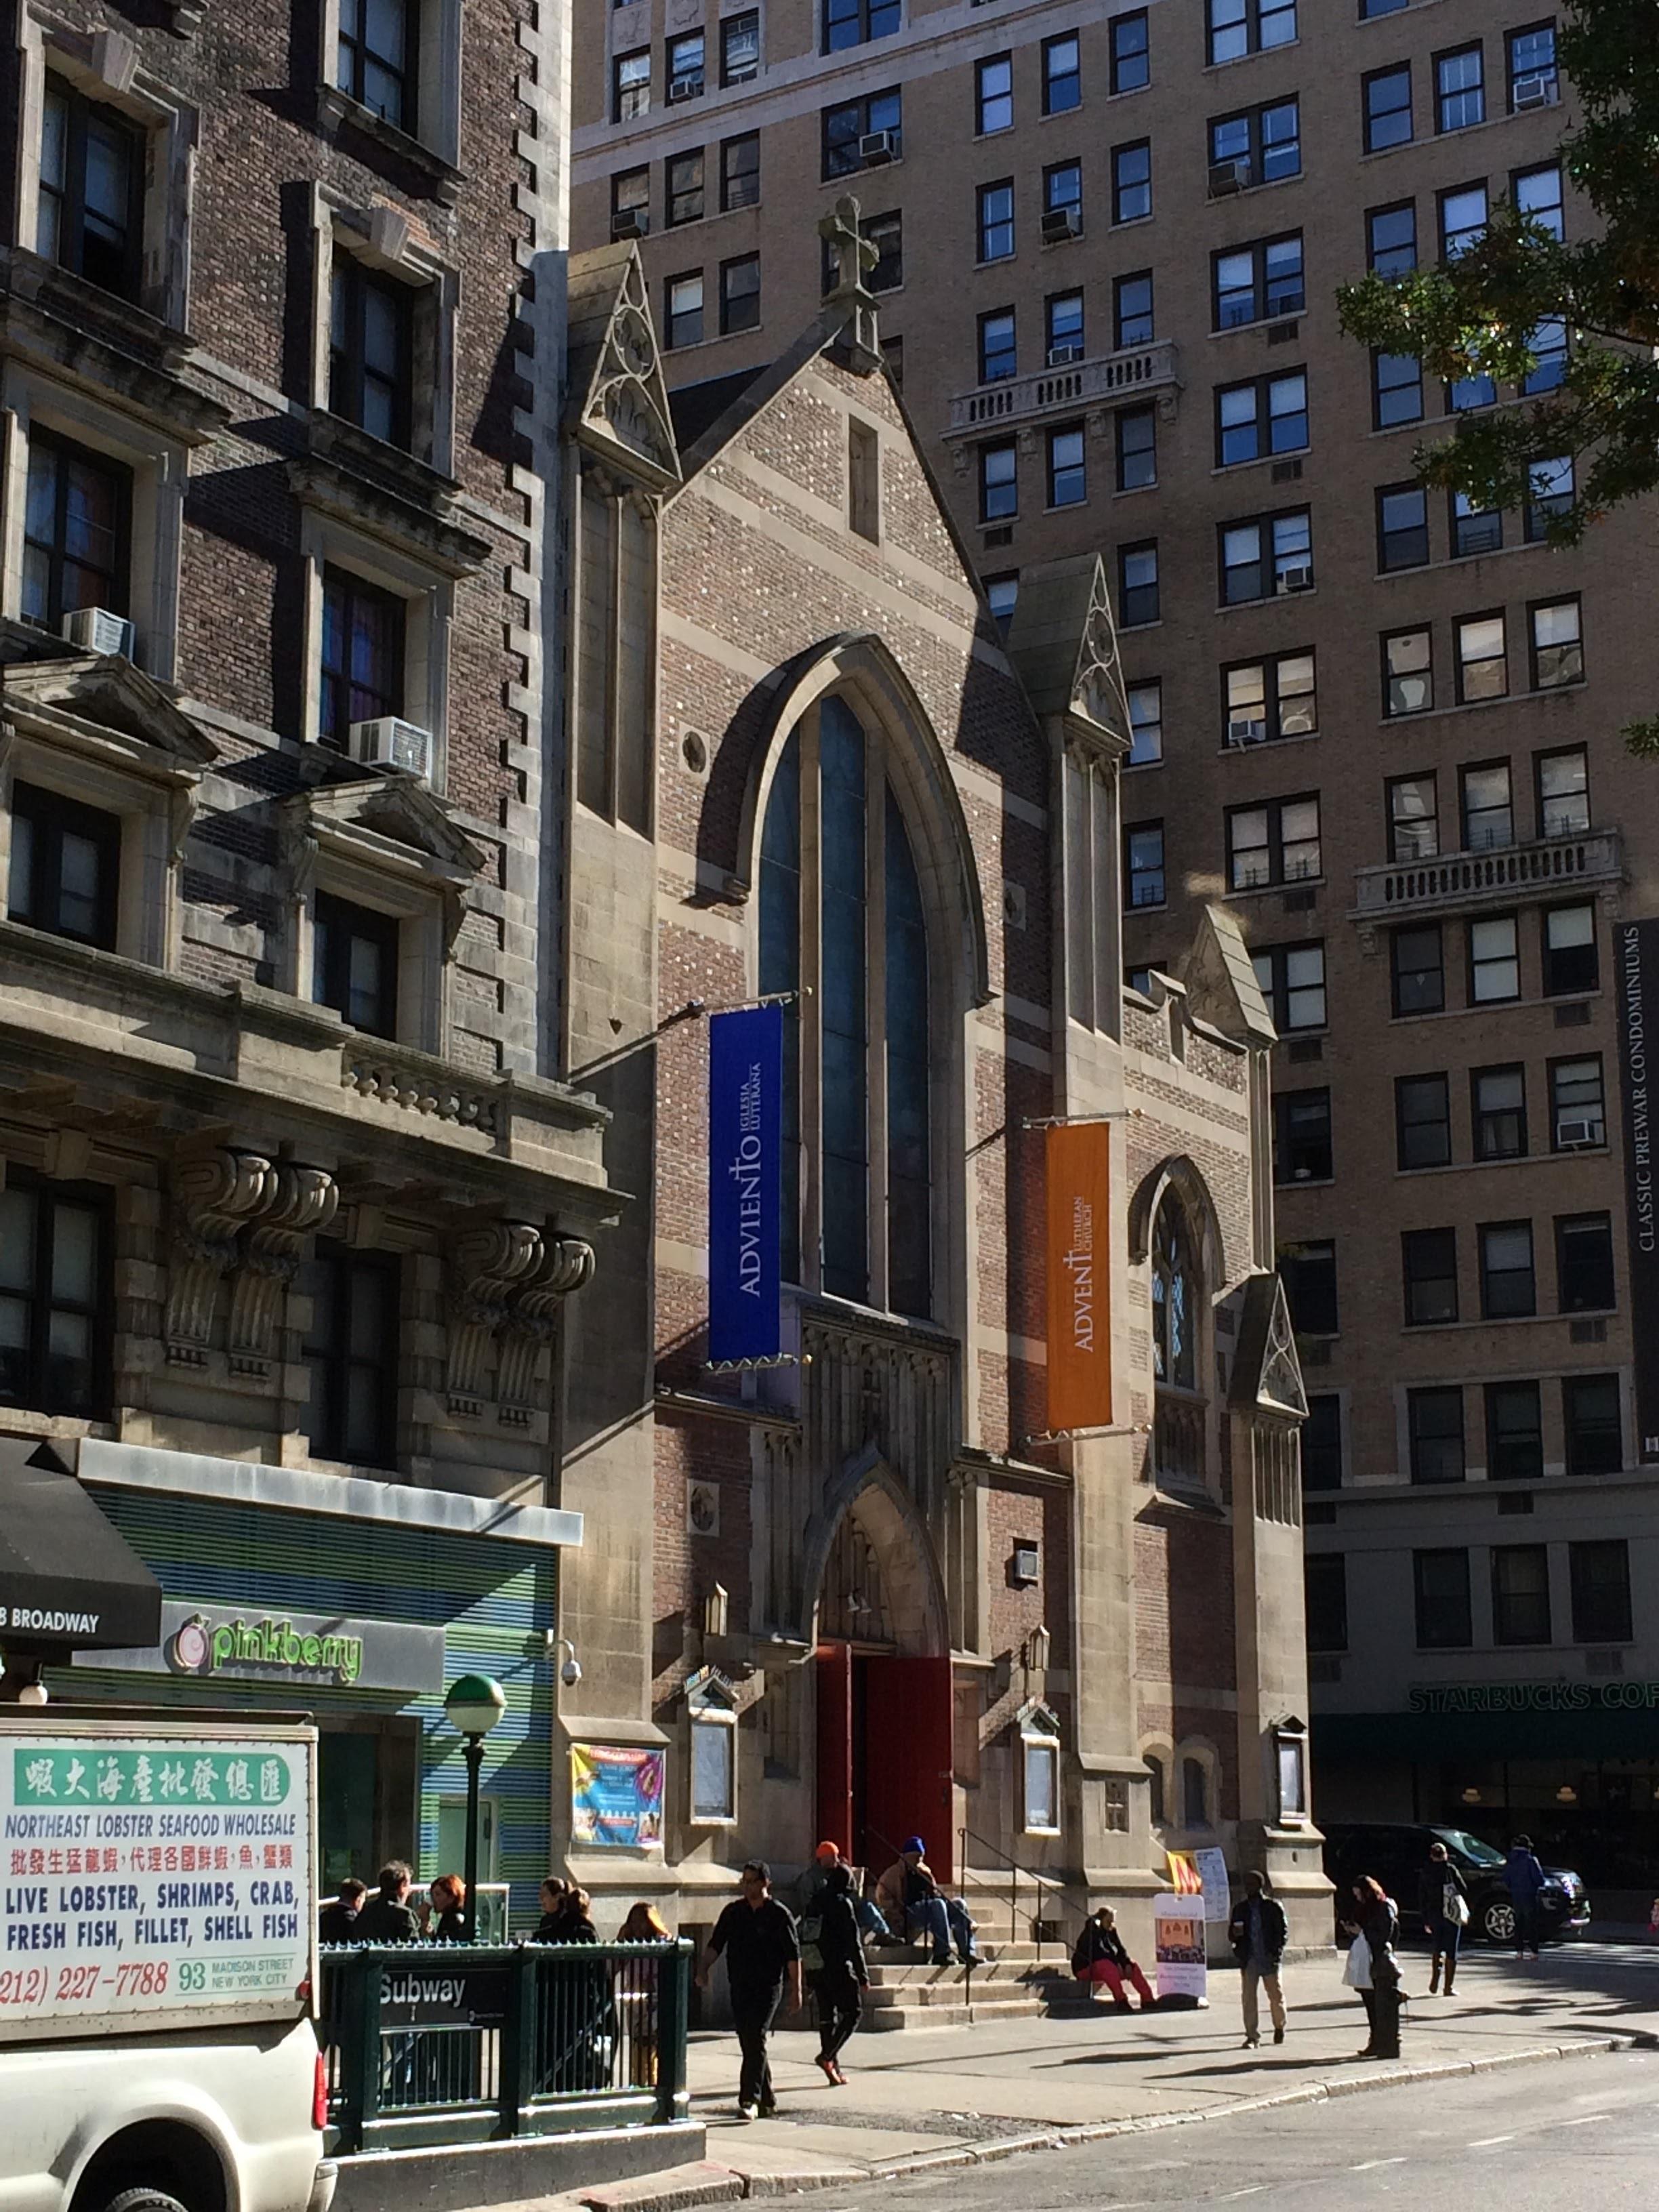 17. Advent Lutheran Church